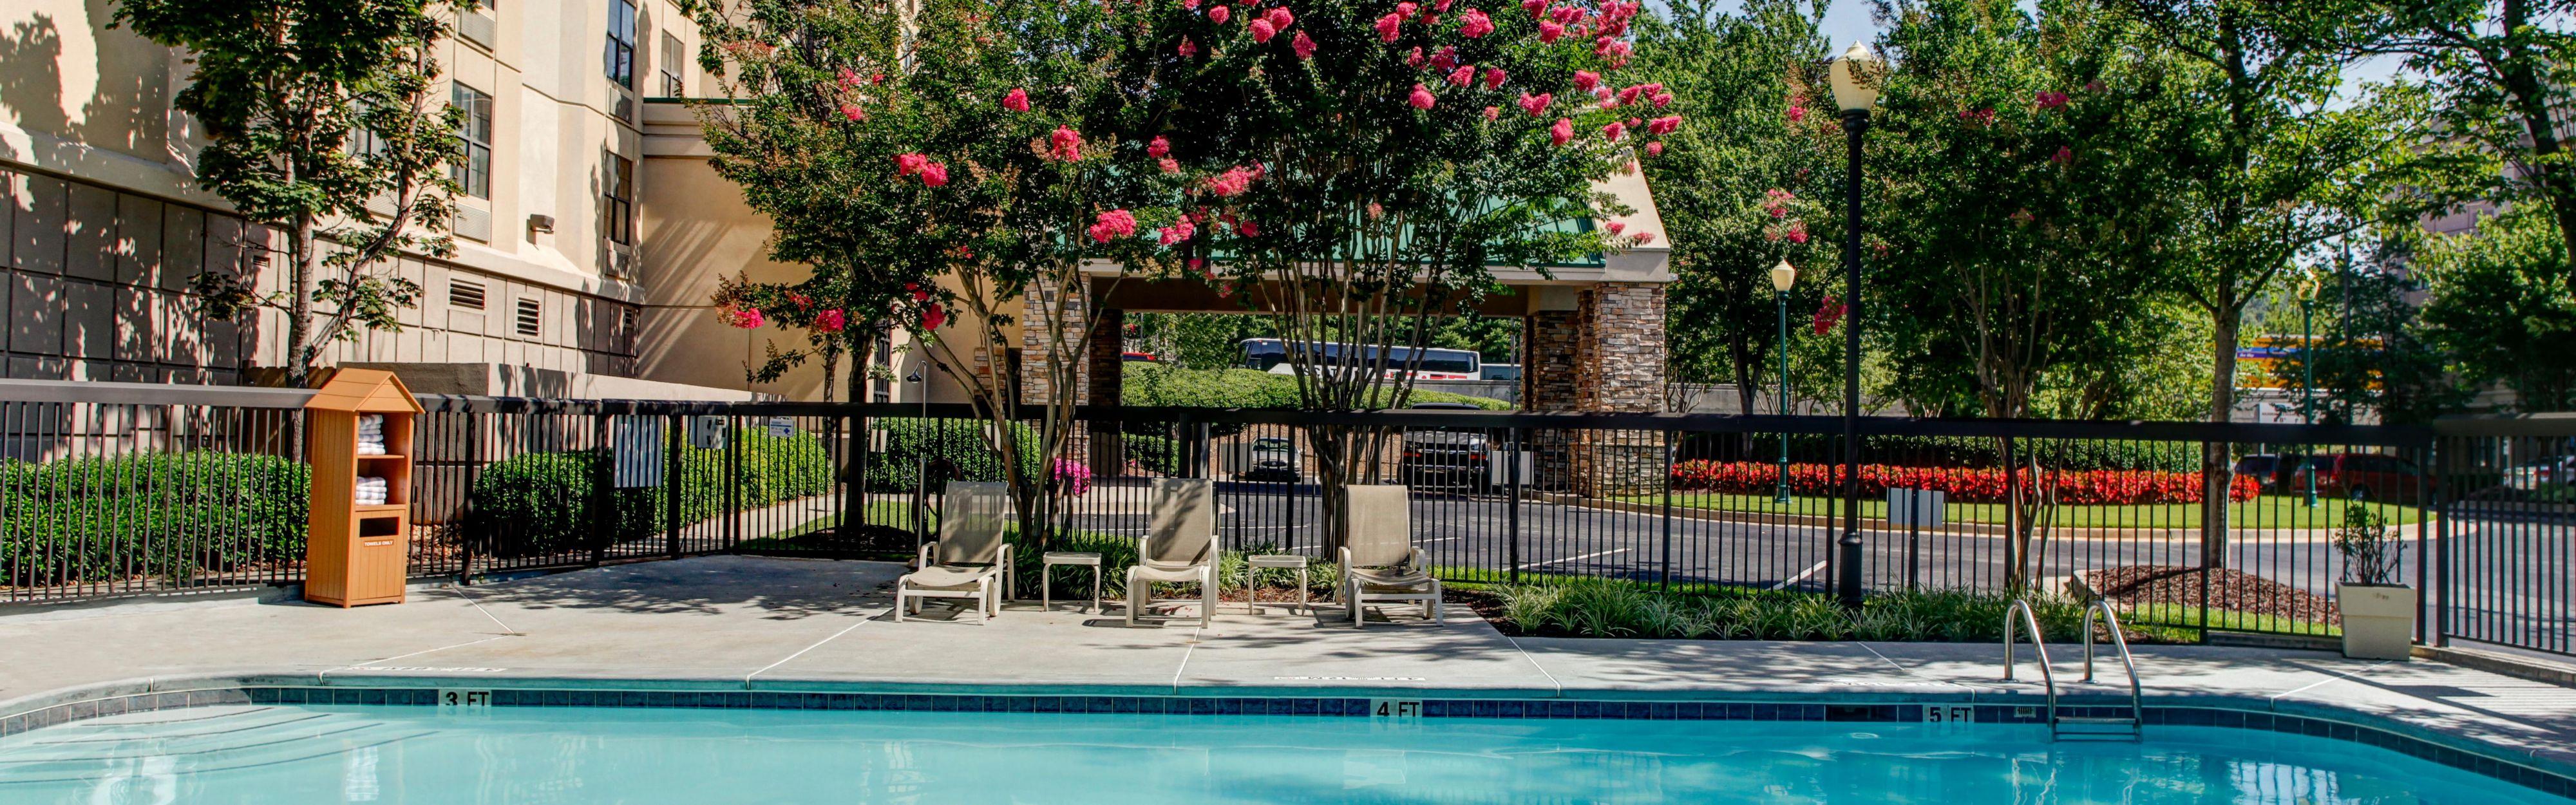 Holiday Inn Express & Suites Atlanta Buckhead image 2